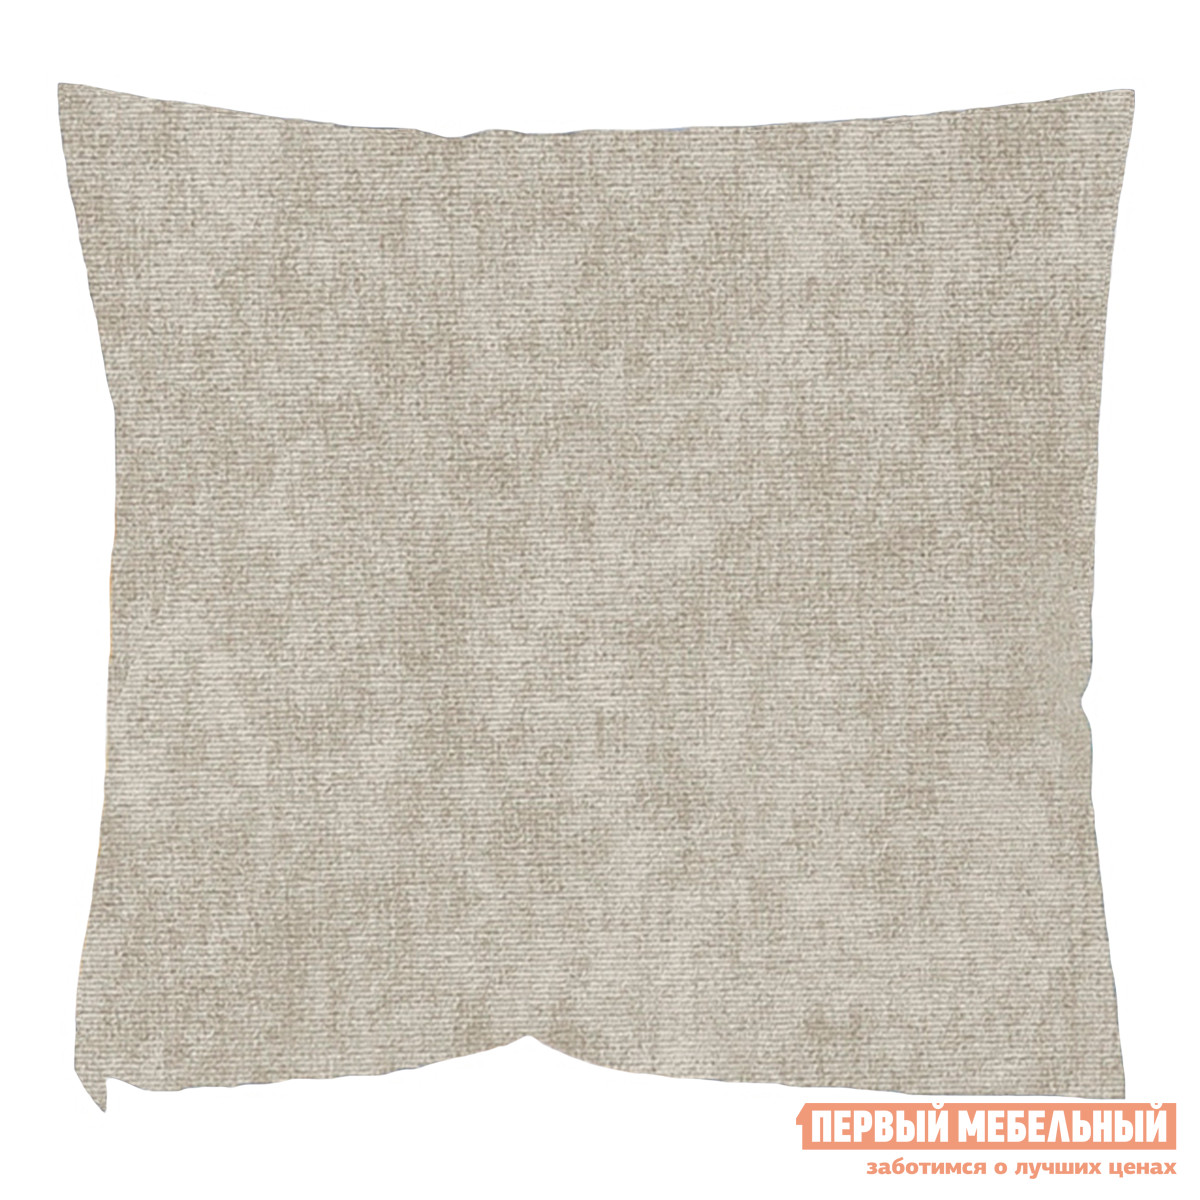 Декоративная подушка DreamBag Серый Микровельвет цены онлайн